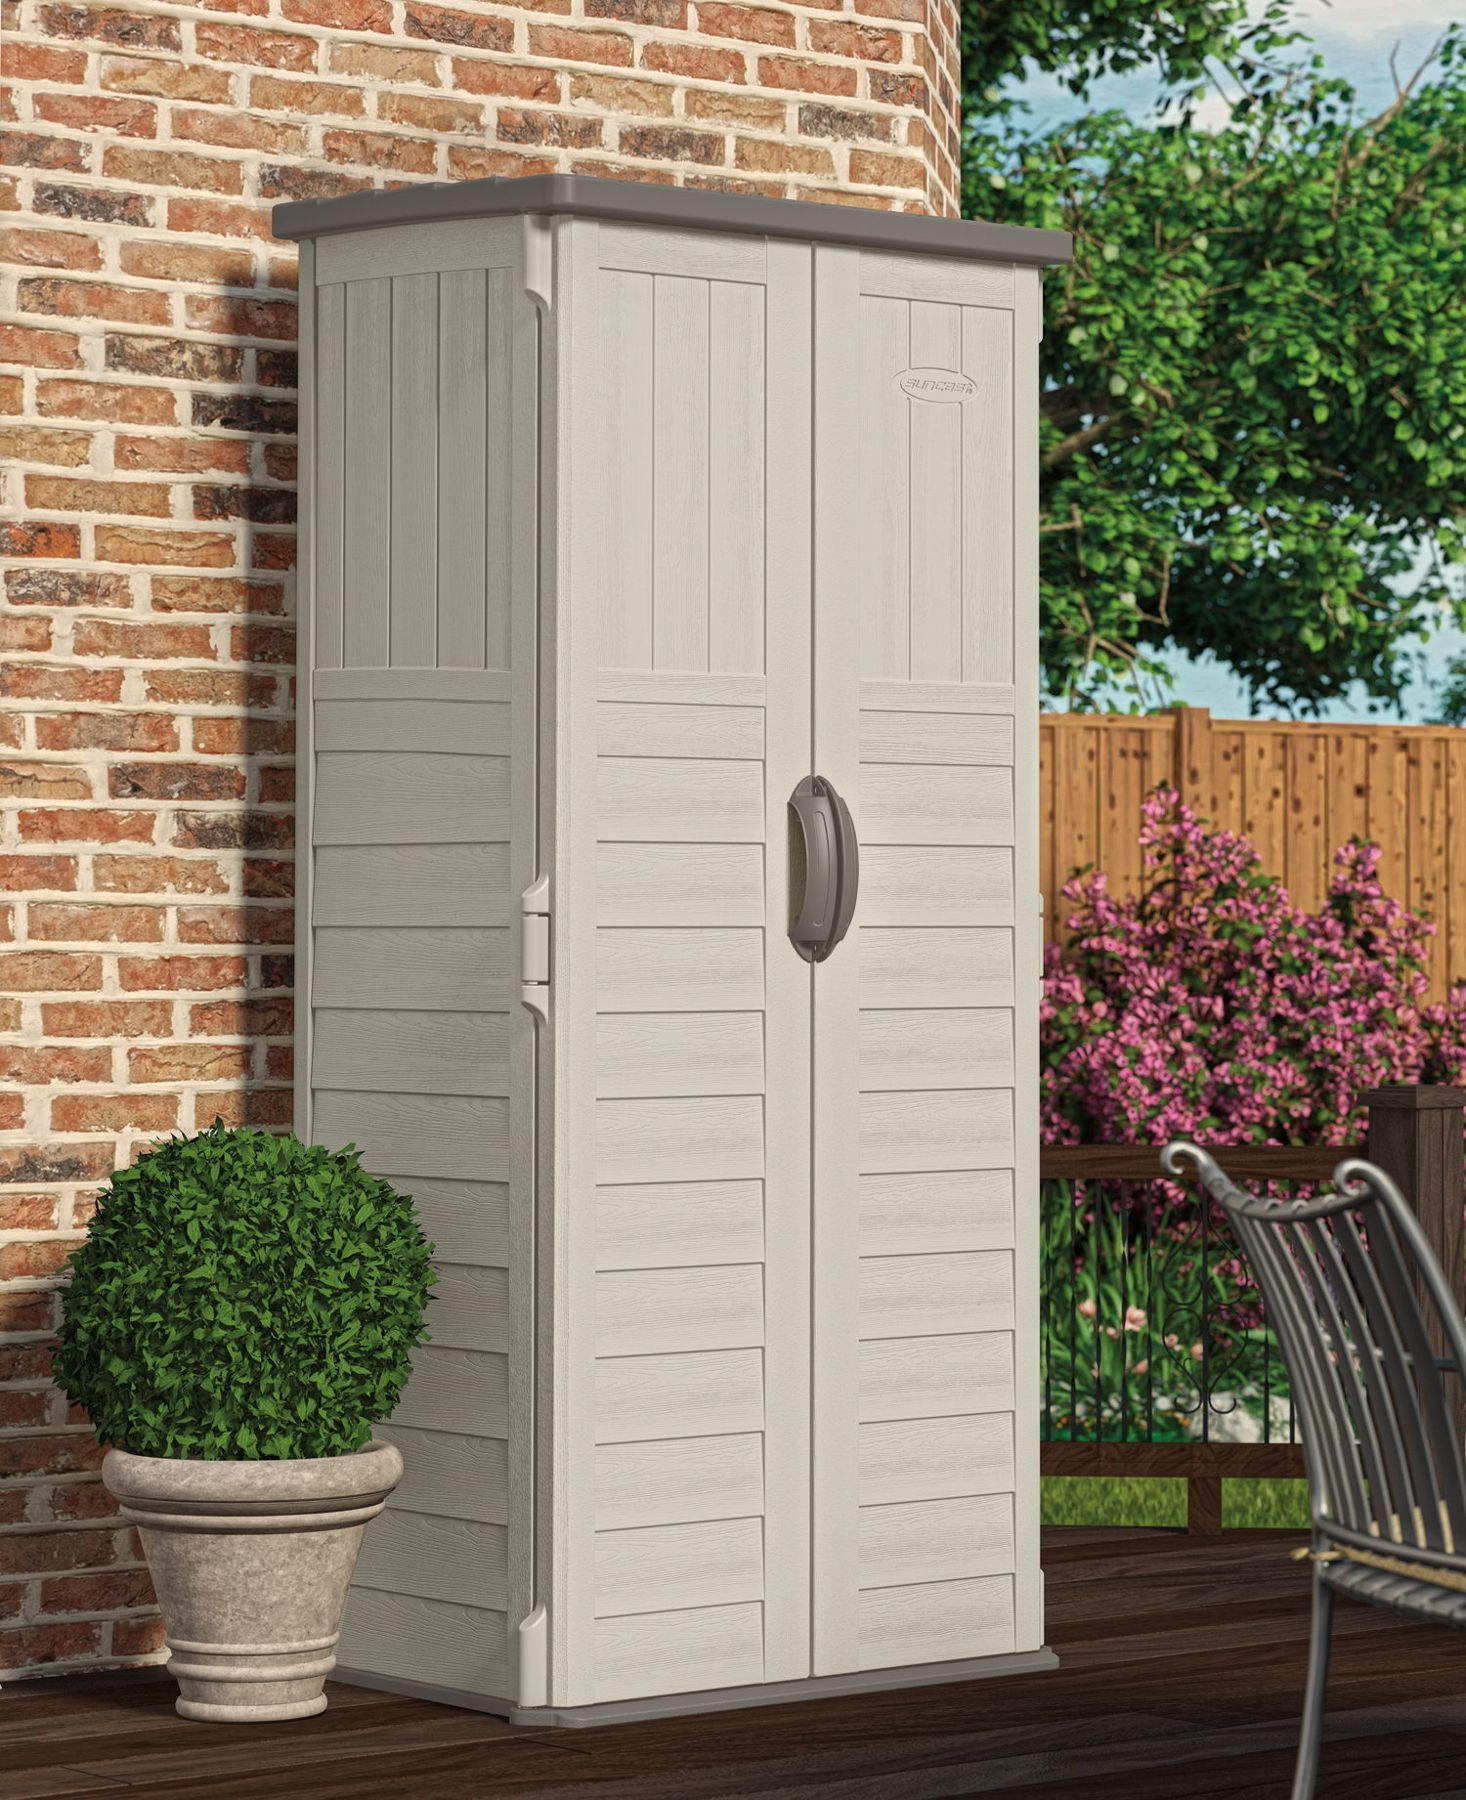 Suncast 3x2 mannington plastic garden storage shed for Garden shed shelving